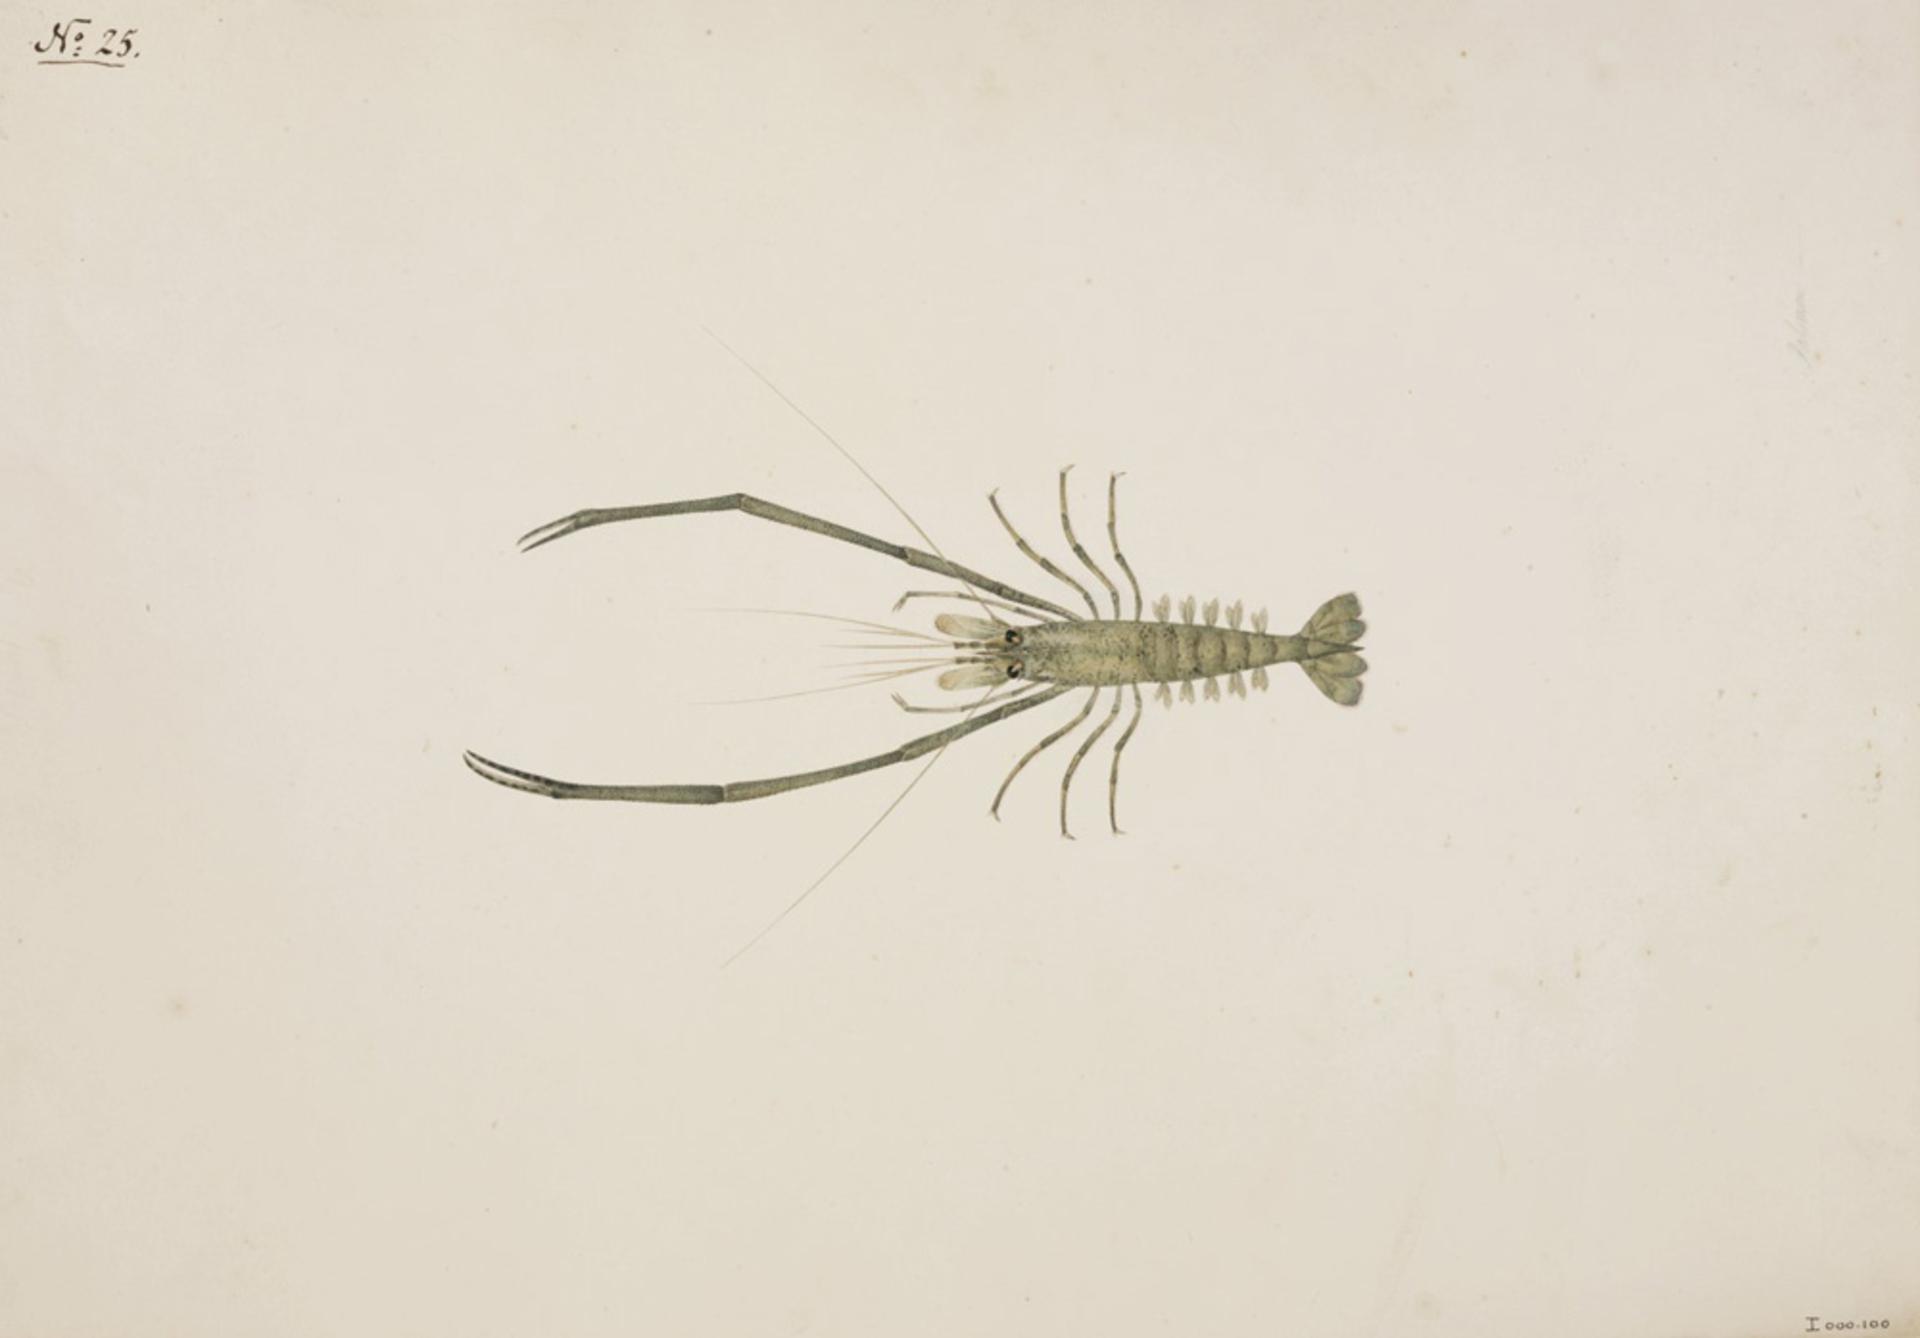 RMNH.ART.56 | Macrobrachium nipponense